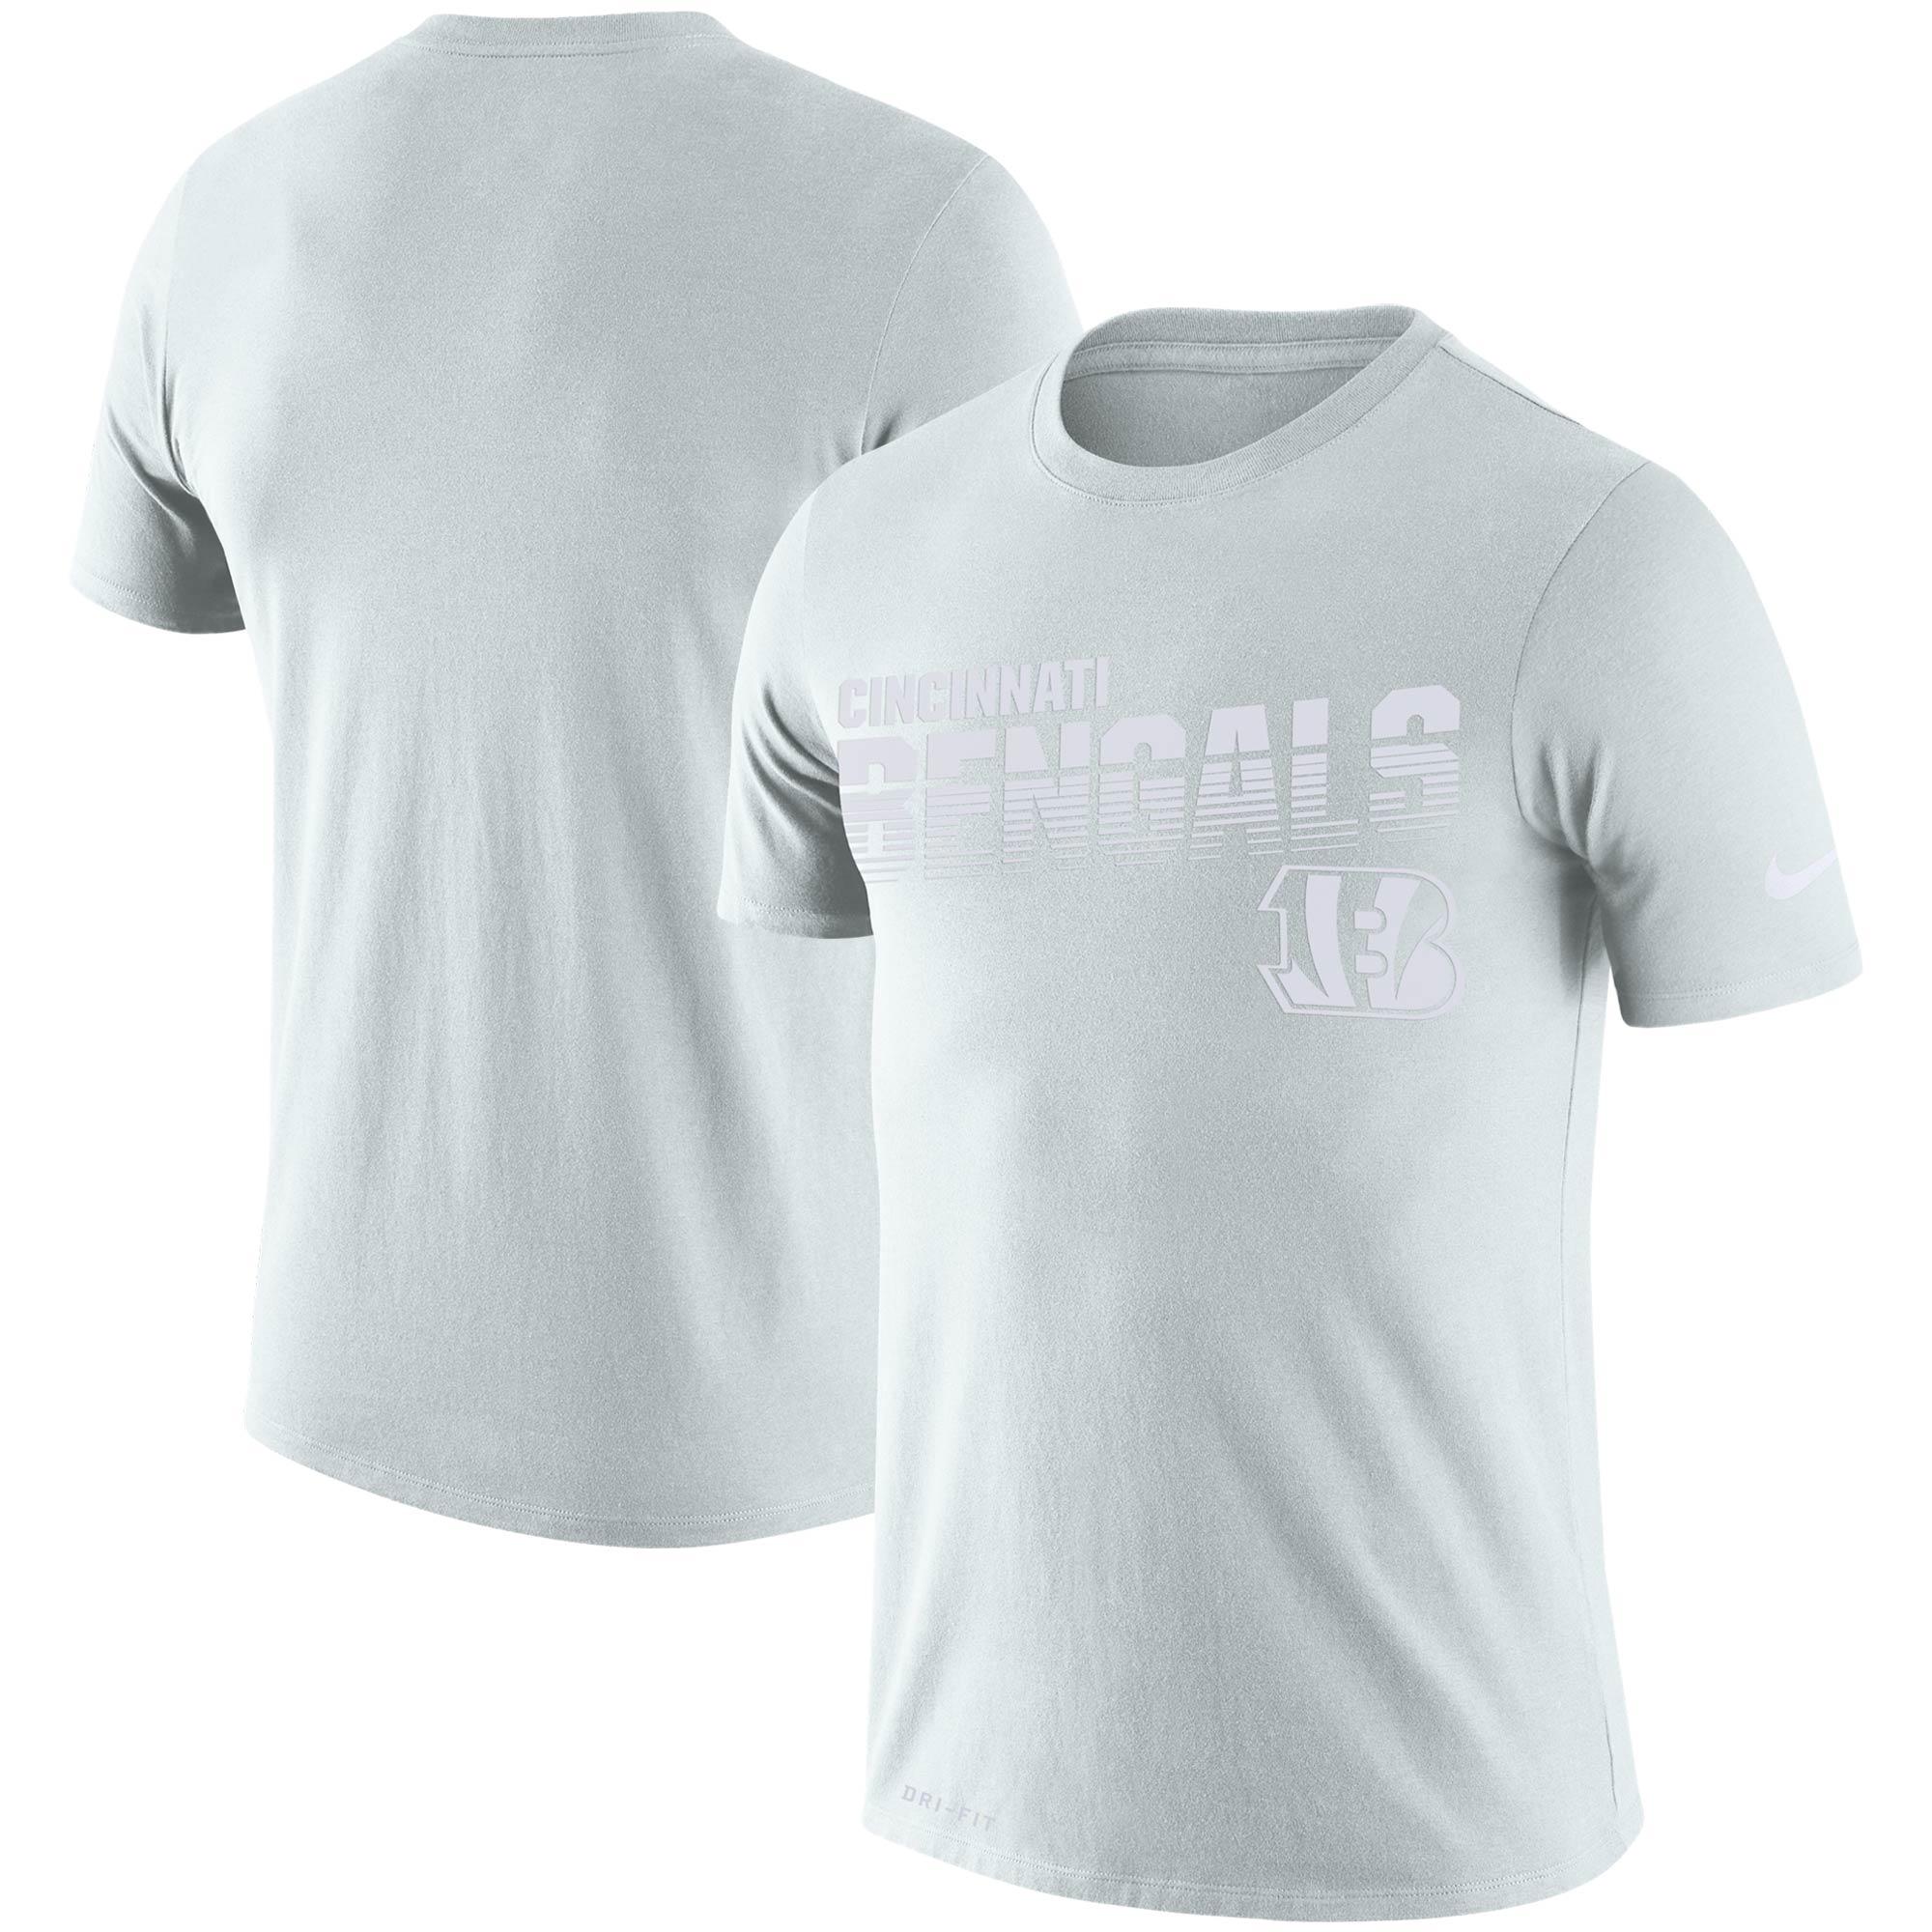 Cincinnati Bengals Nike NFL 100 2019 Sideline Platinum Performance T-Shirt - White